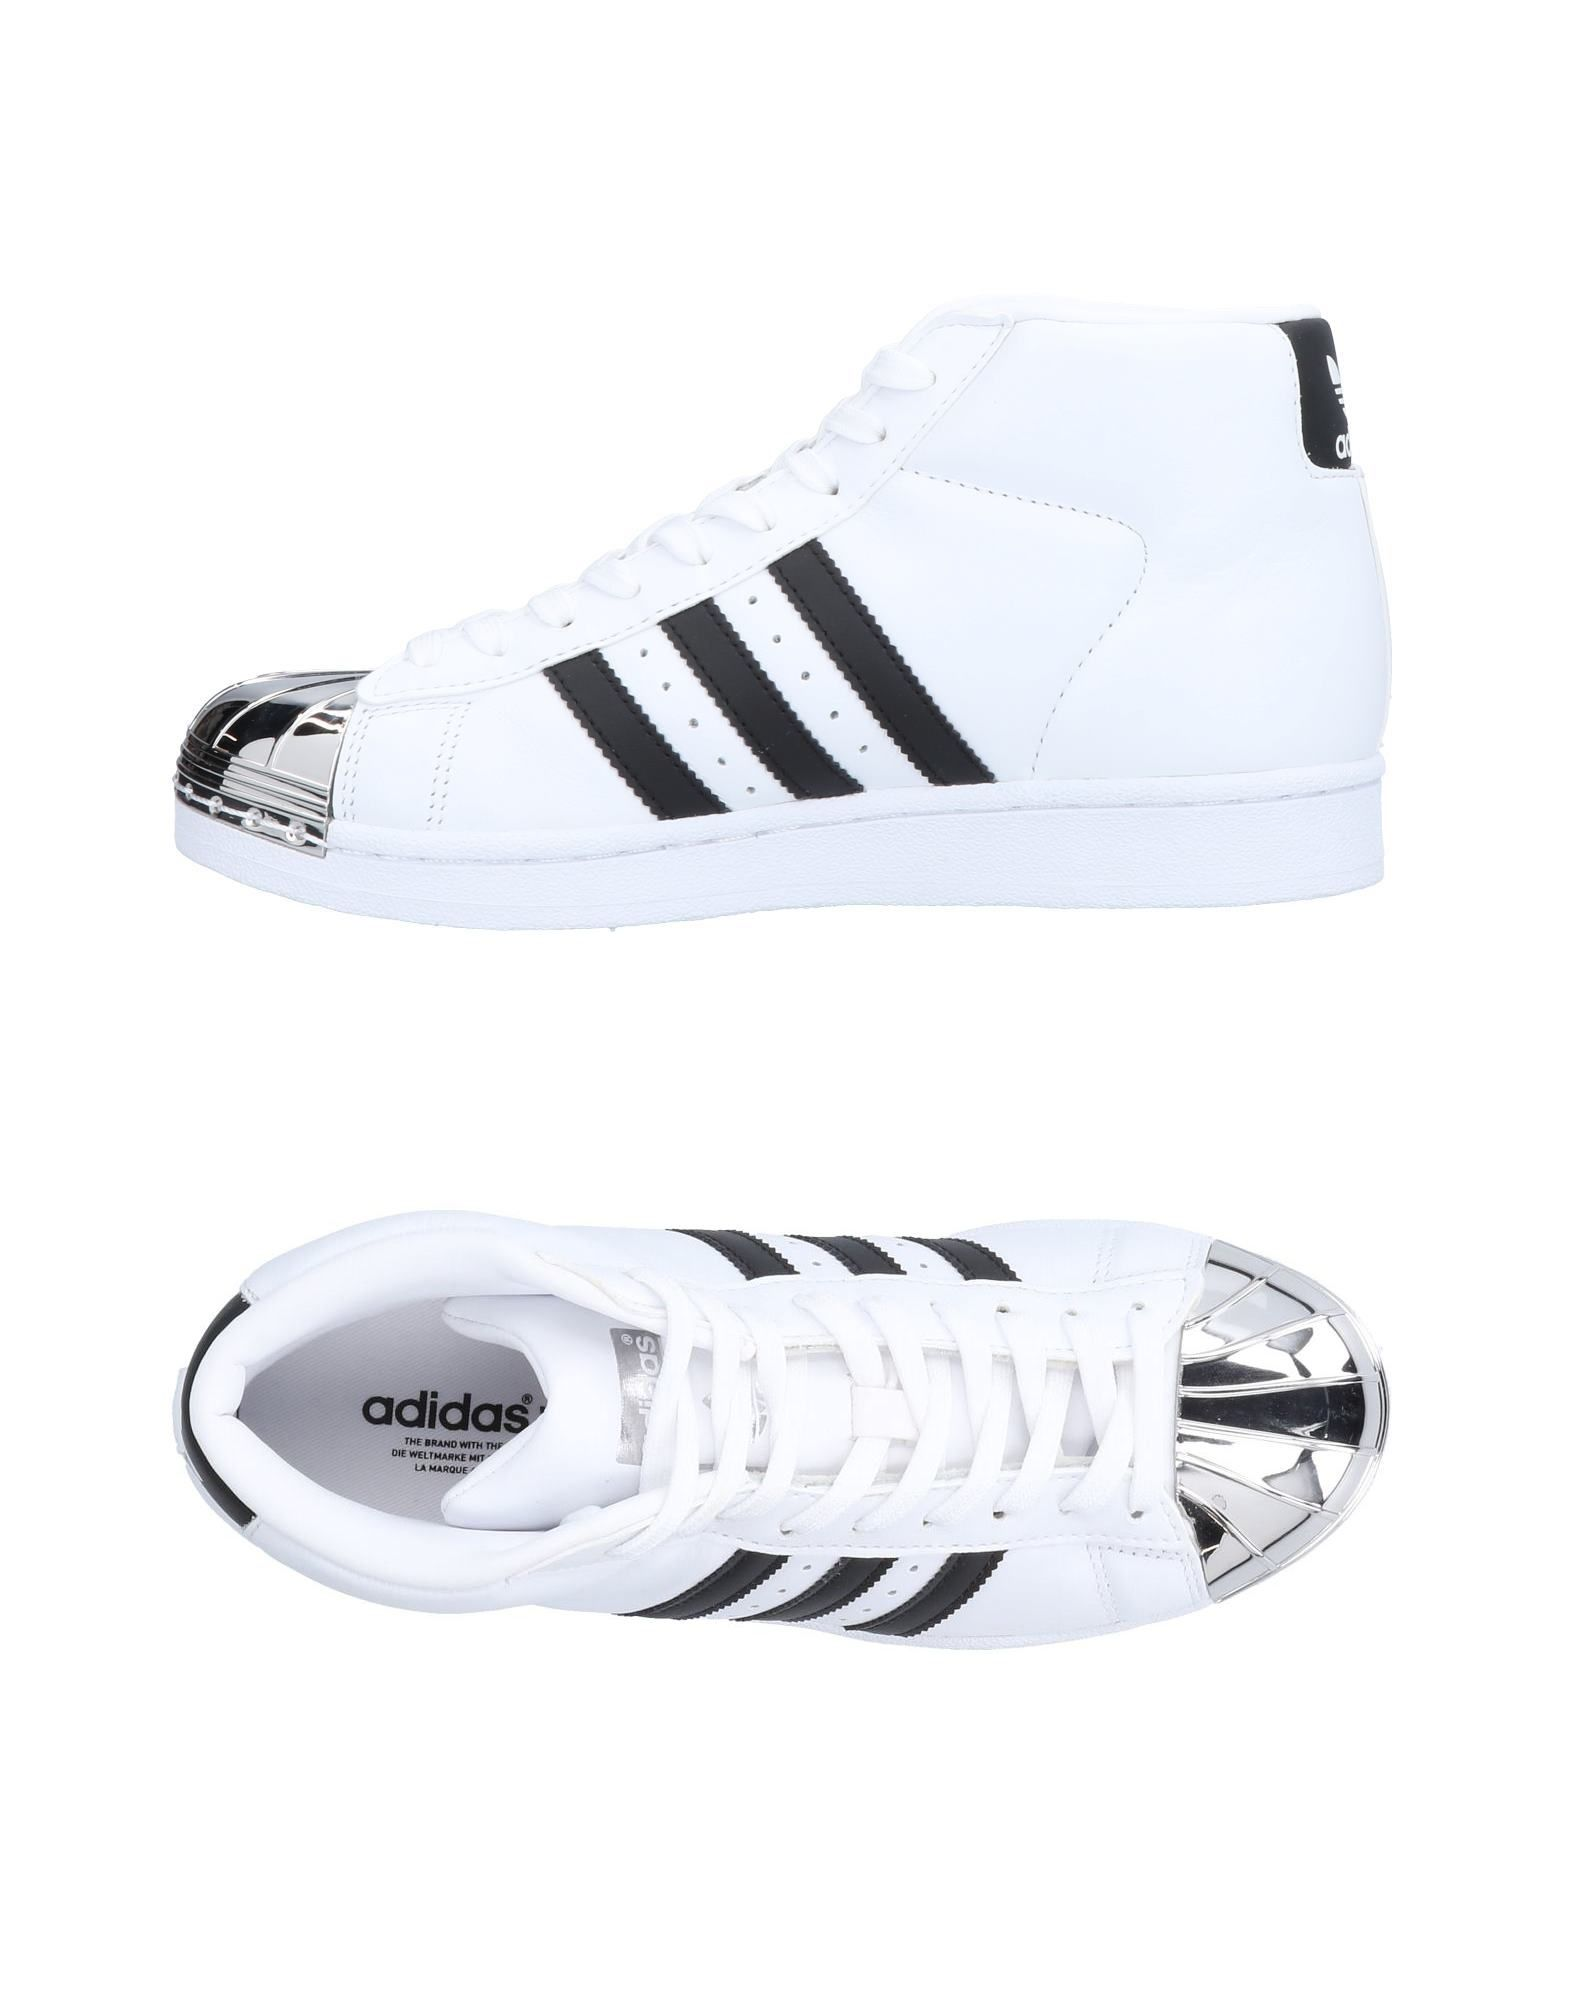 dbb86d5f2d9 ADIDAS ORIGINALS ΠΑΠΟΥΤΣΙΑ Χαμηλά sneakers, Γυναικεία sneakers ...